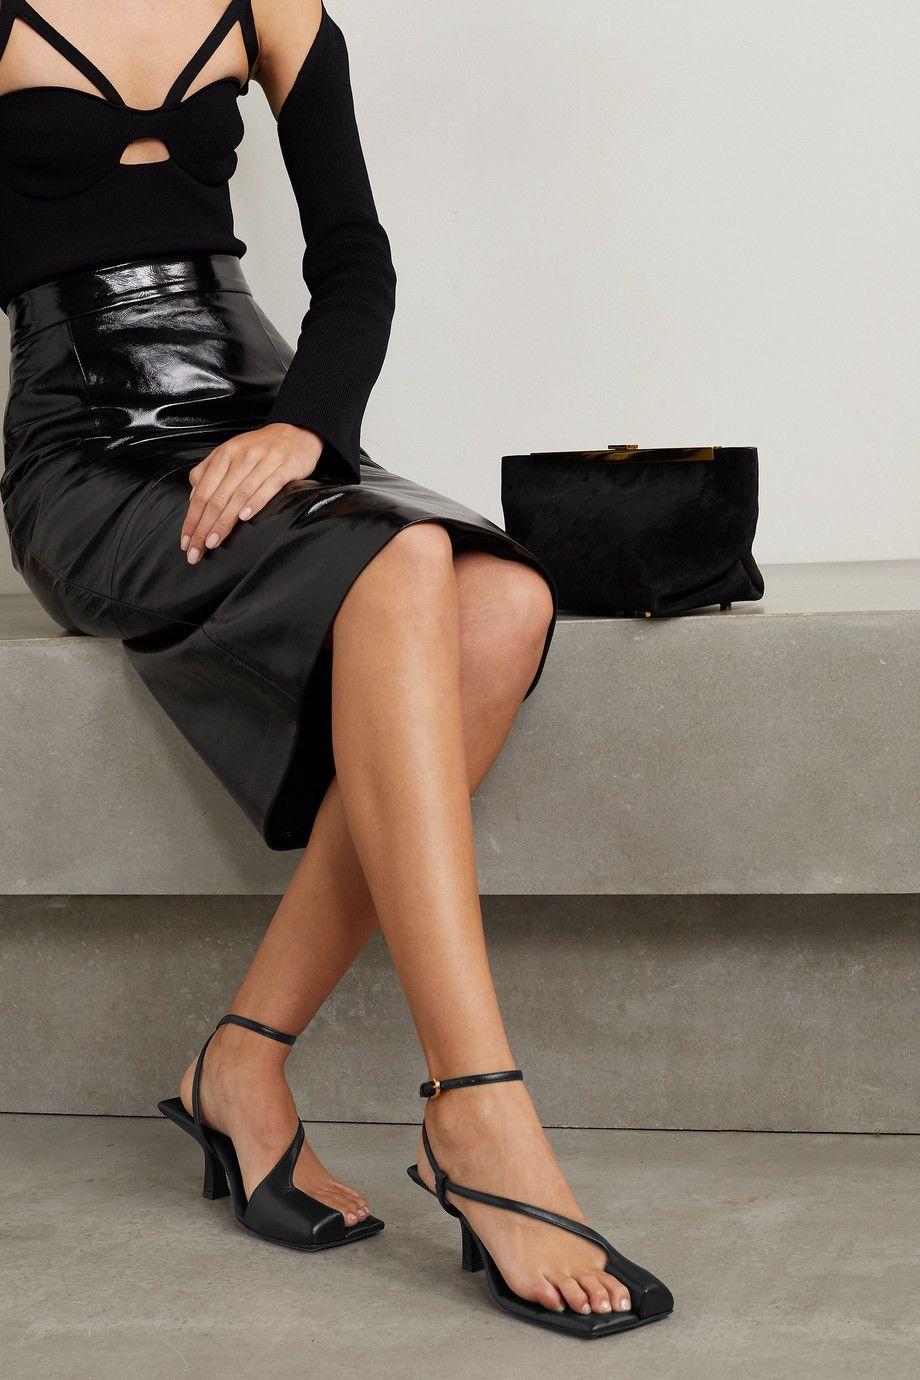 best new fashion items 286246 1629961175763